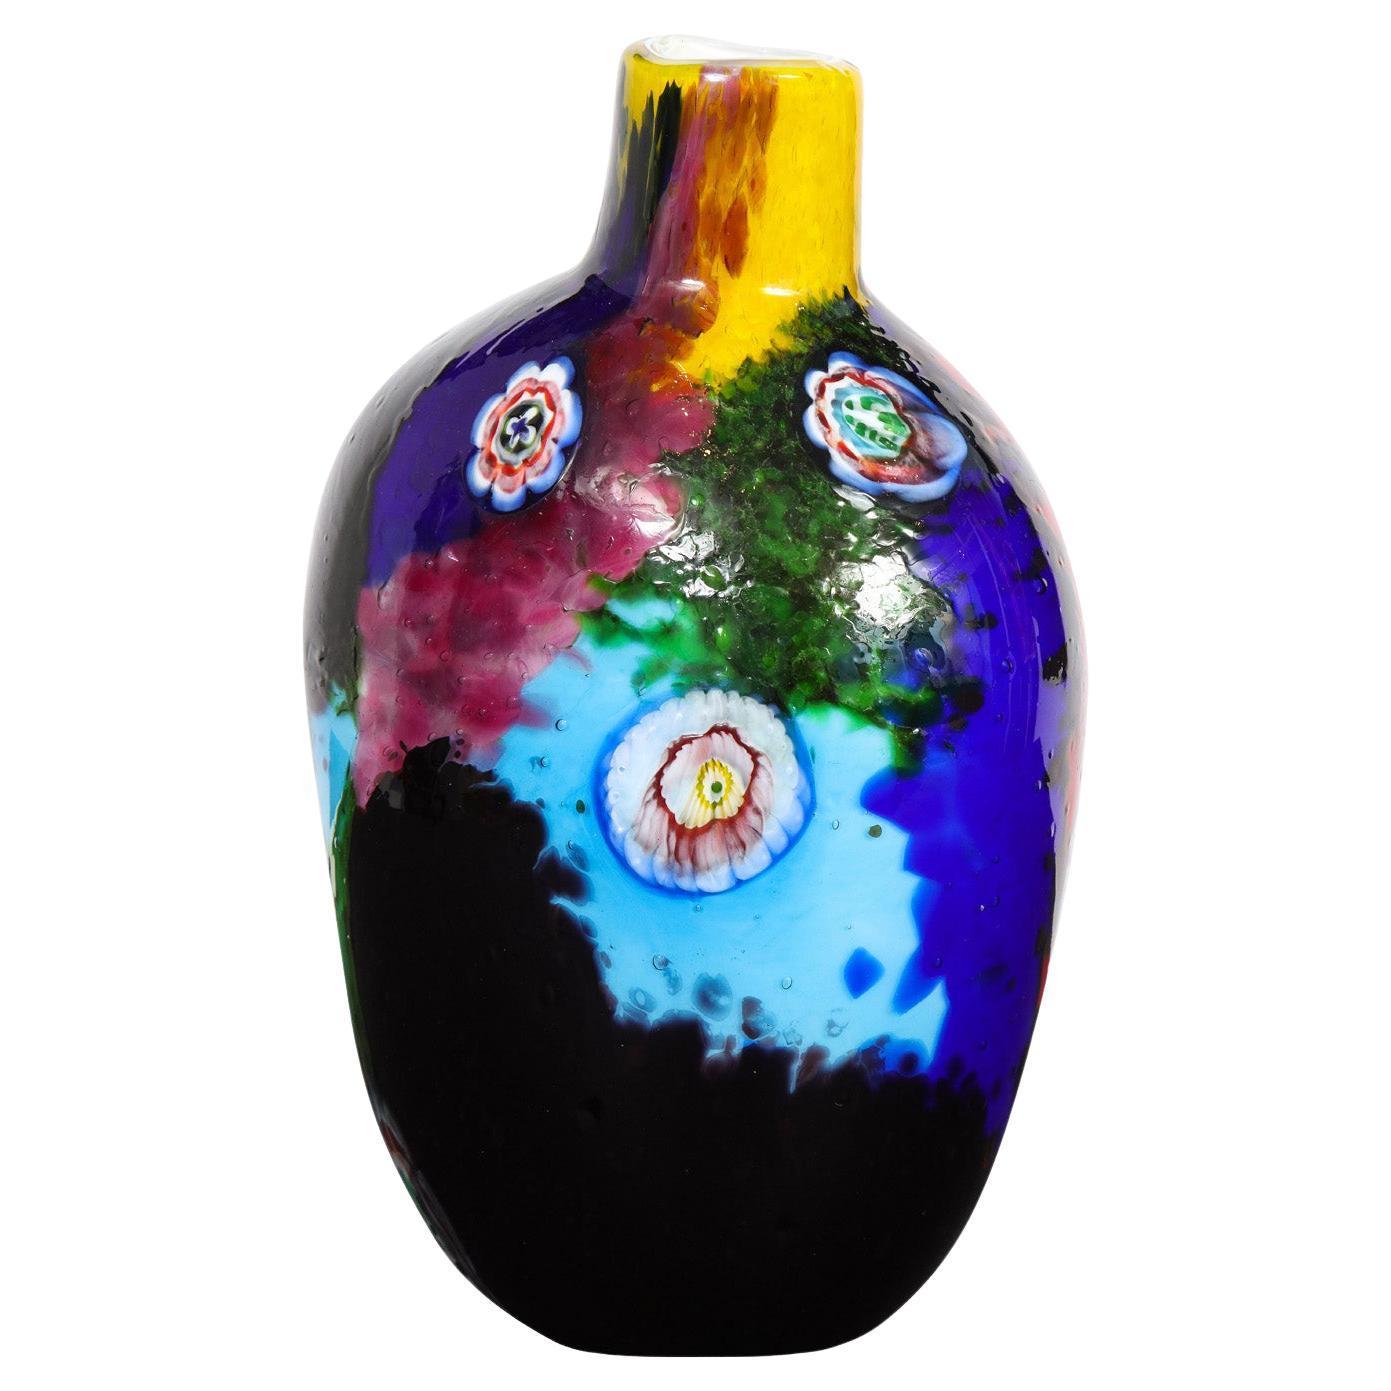 Colorful Handblown Glass Vase by A.V.E.M. 1960s